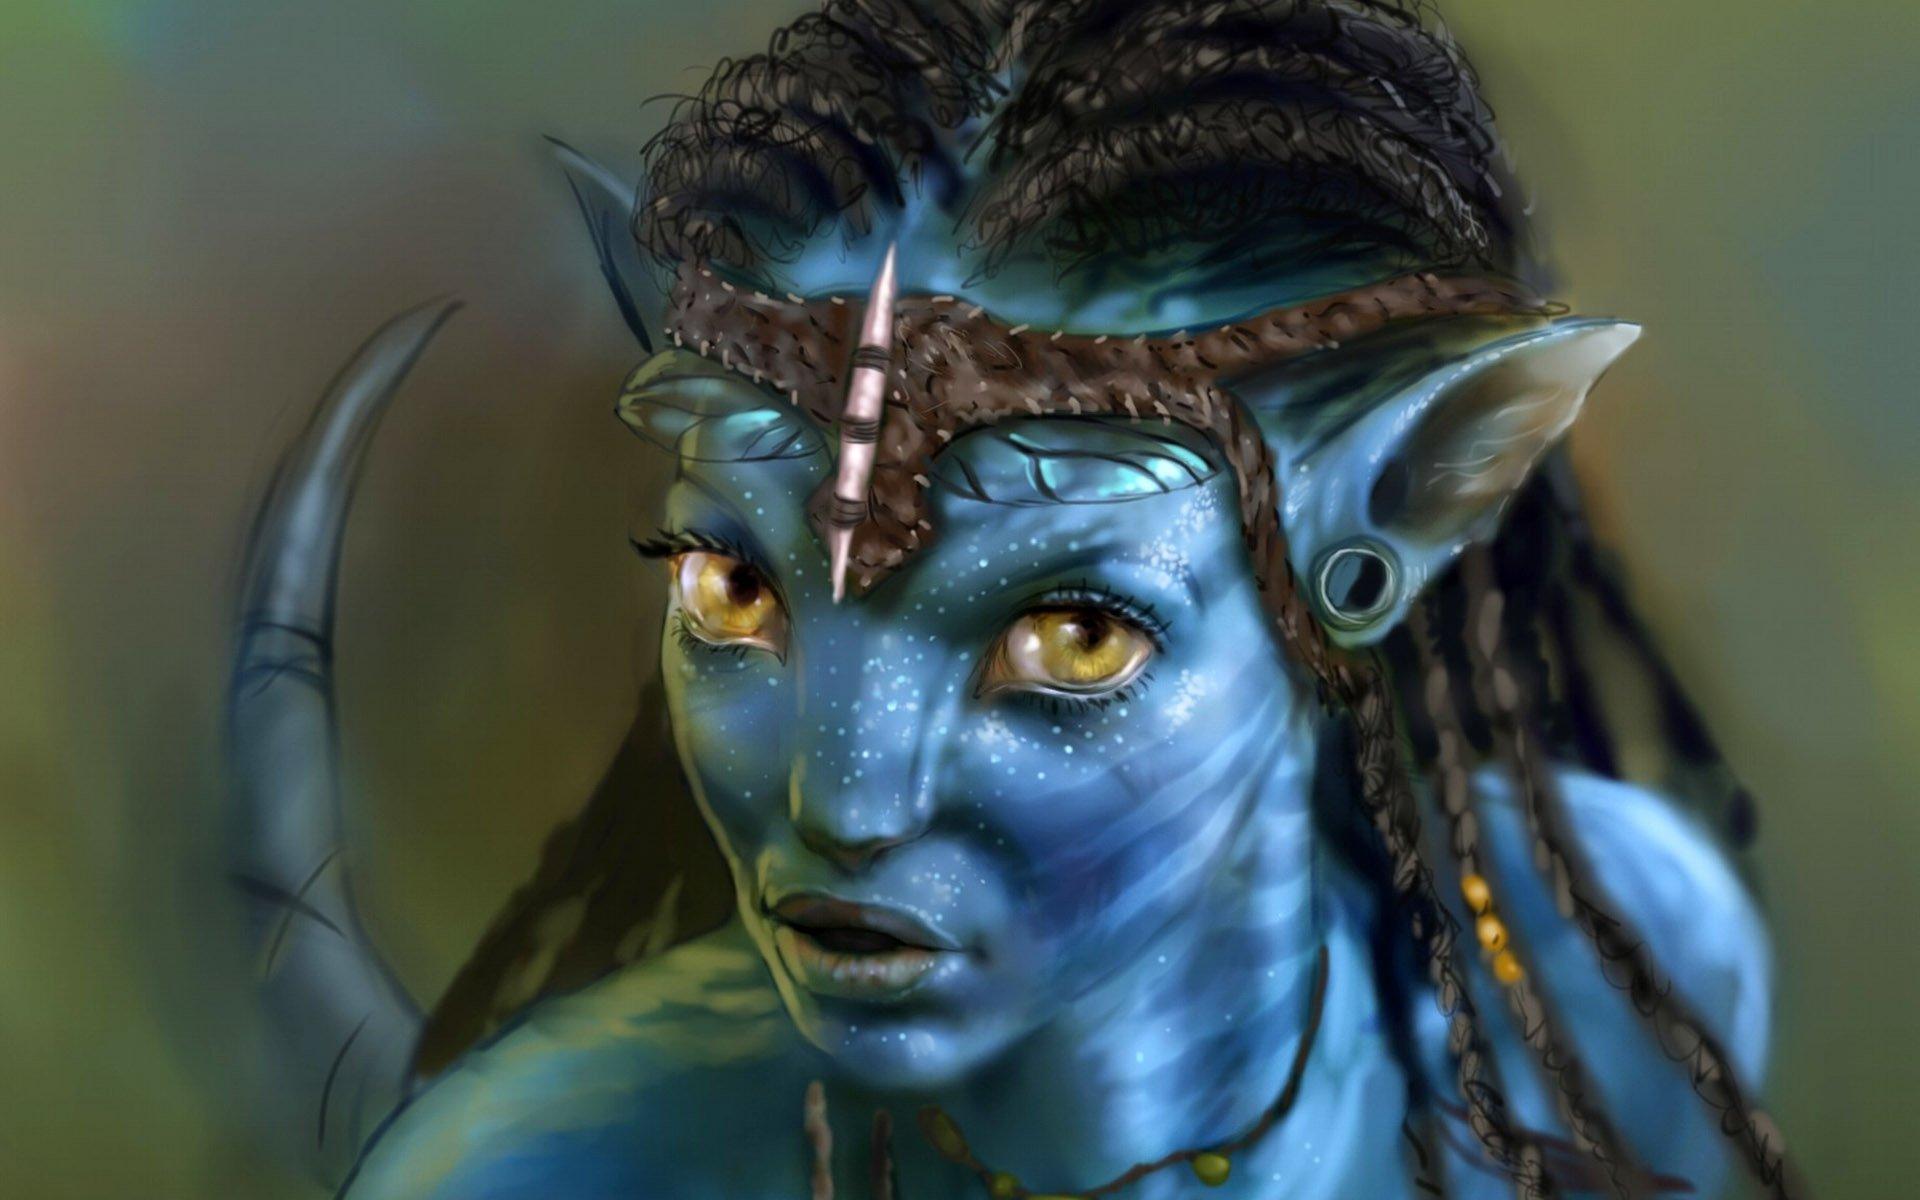 Avatar girls images 75